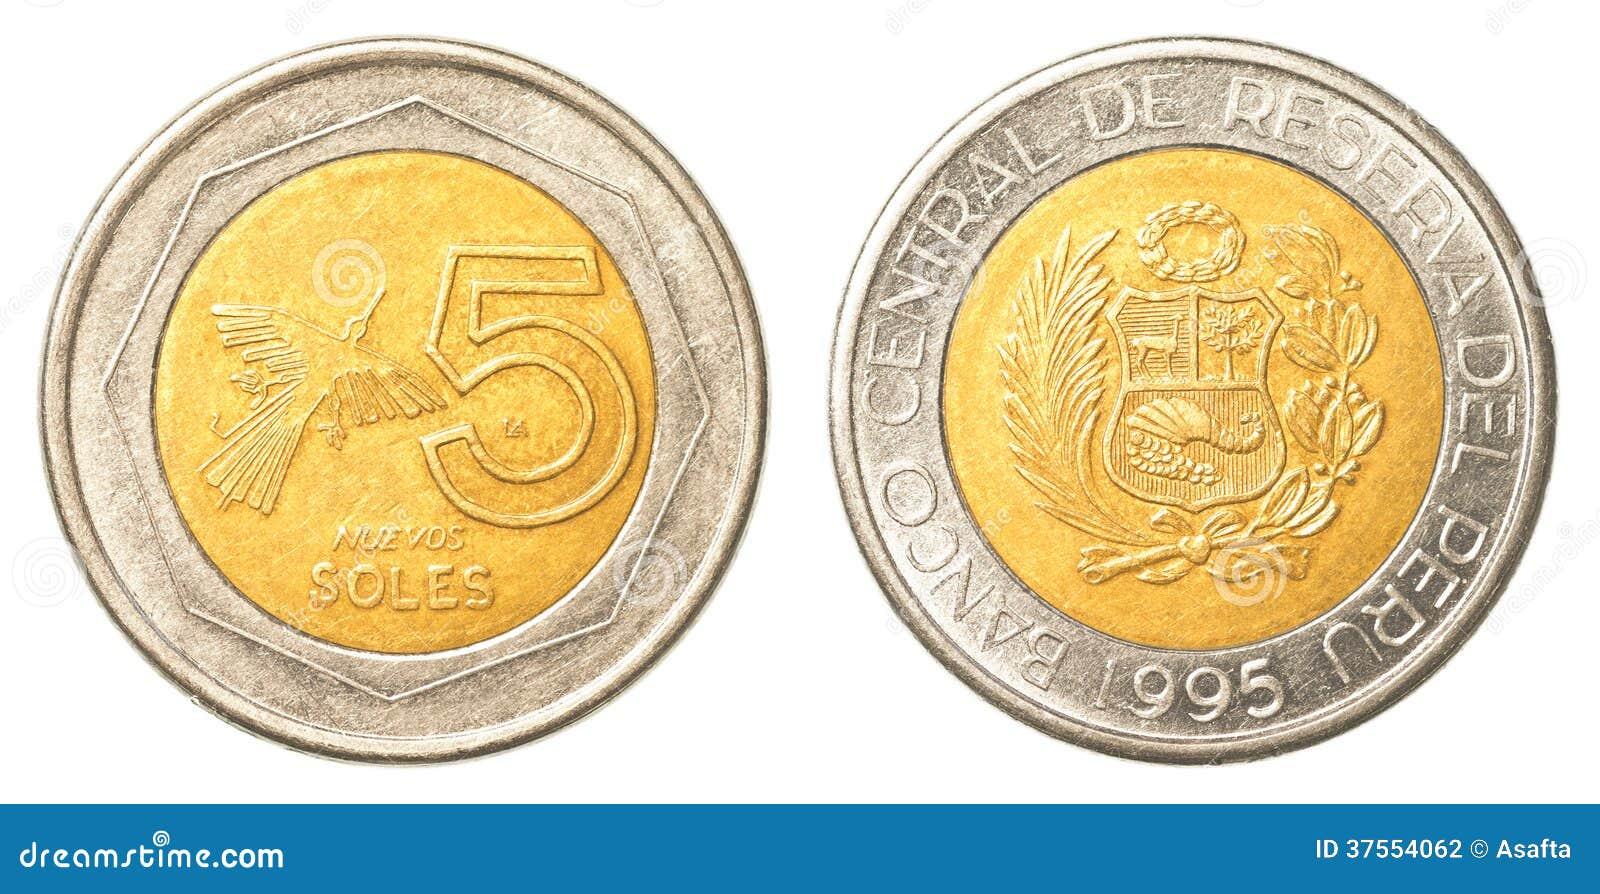 Peruvian Nuevo Sol Coin Stock Photography - Image: 37554062